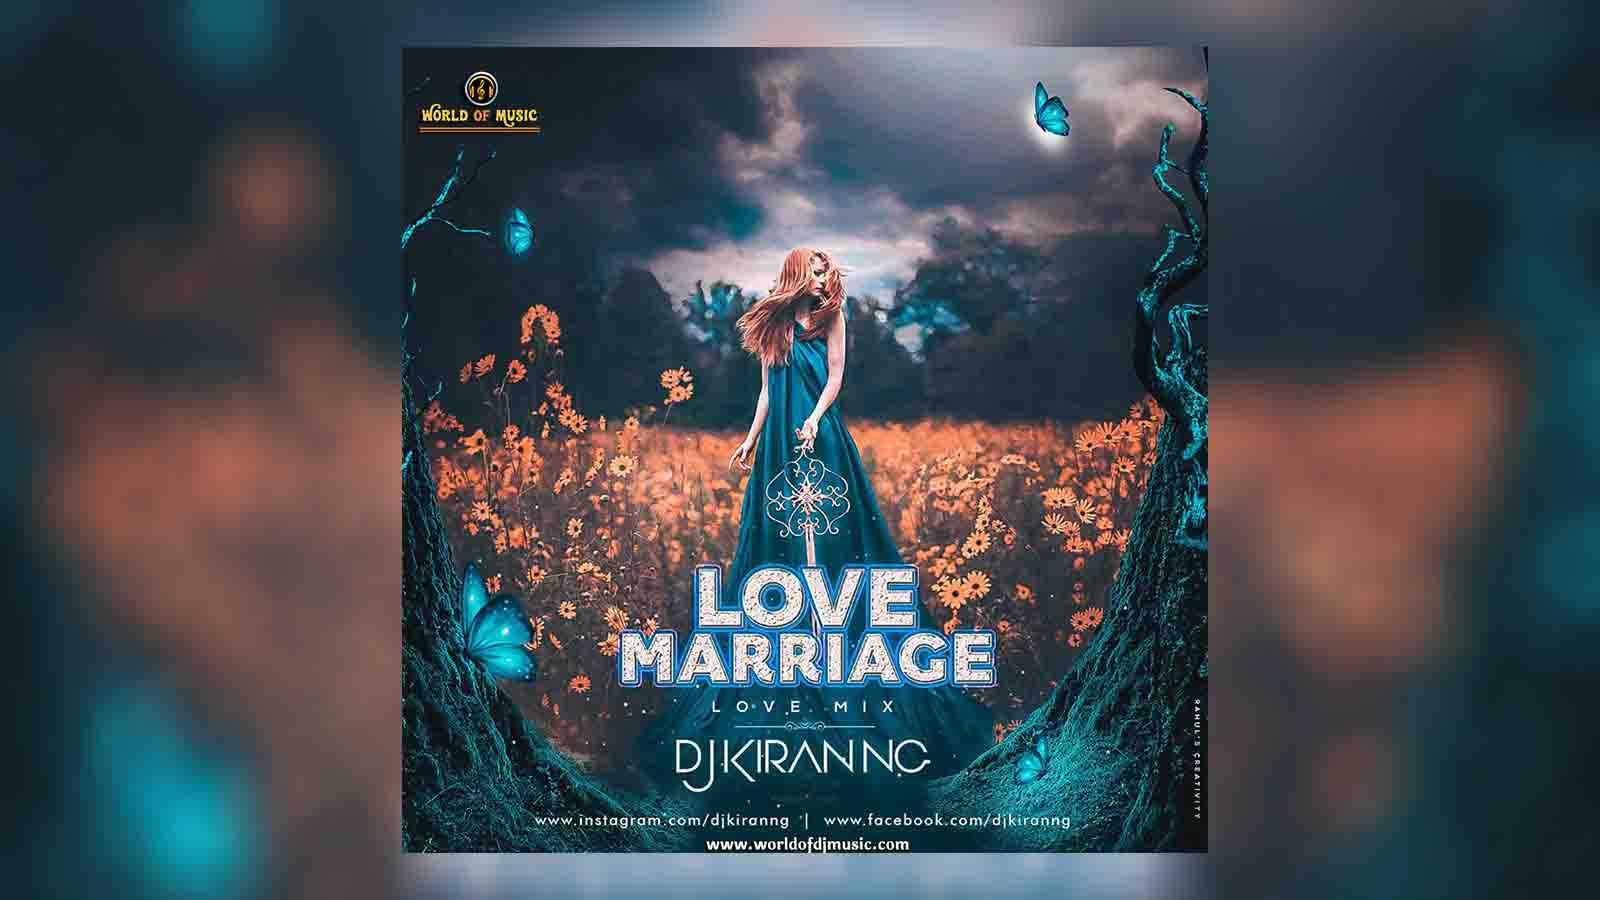 Love Marriage (Remix) - Dj Kiran NG